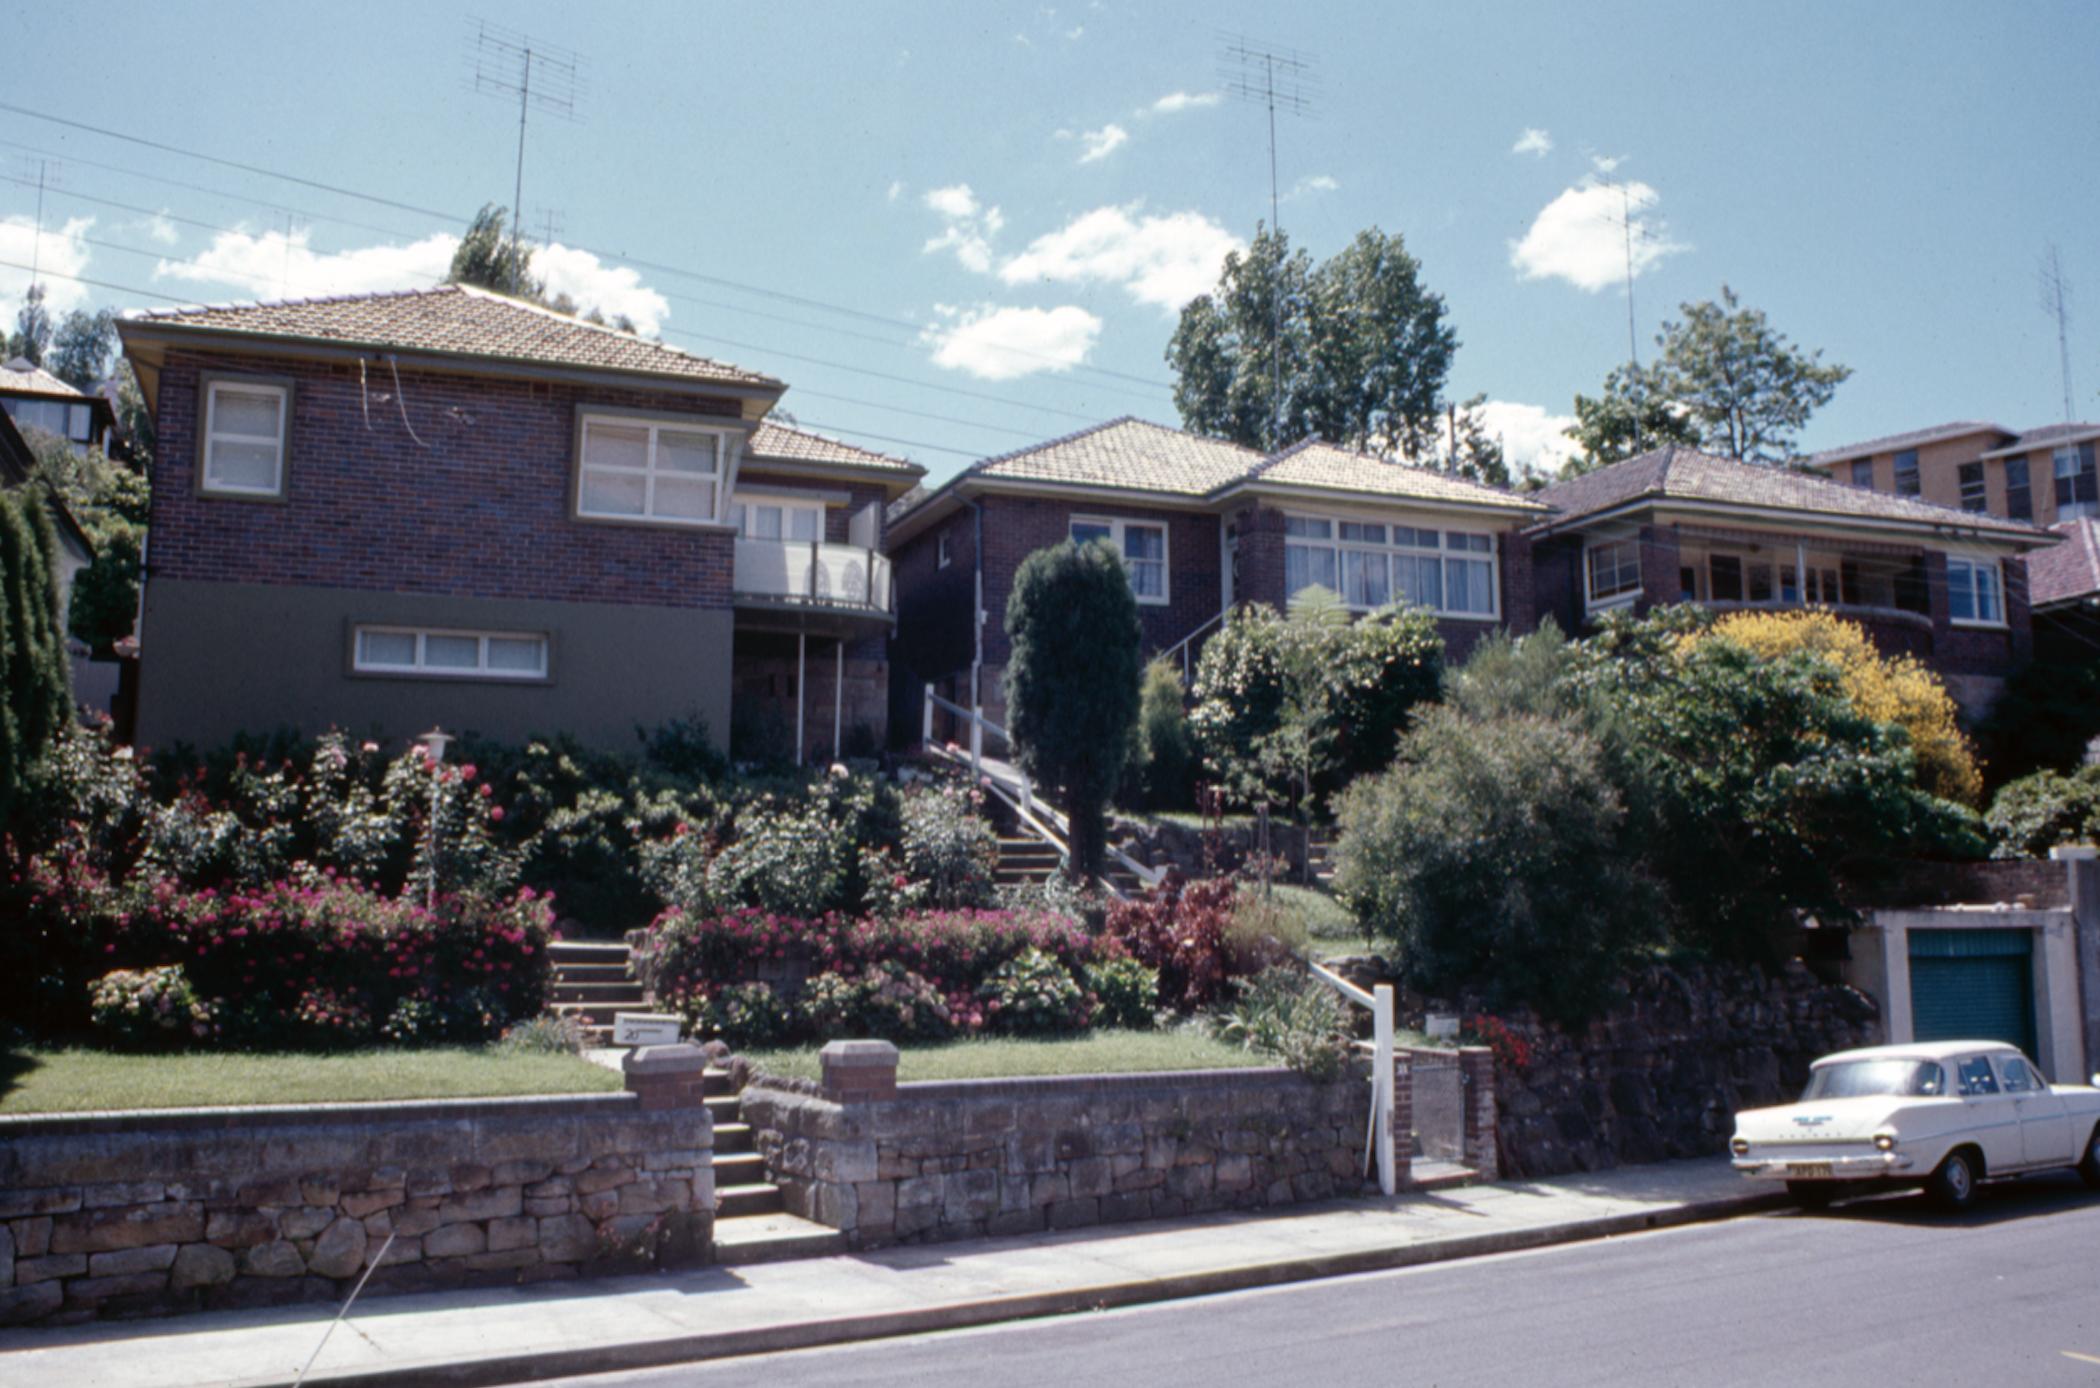 Botanic Rd, Mosman in the 1970s.